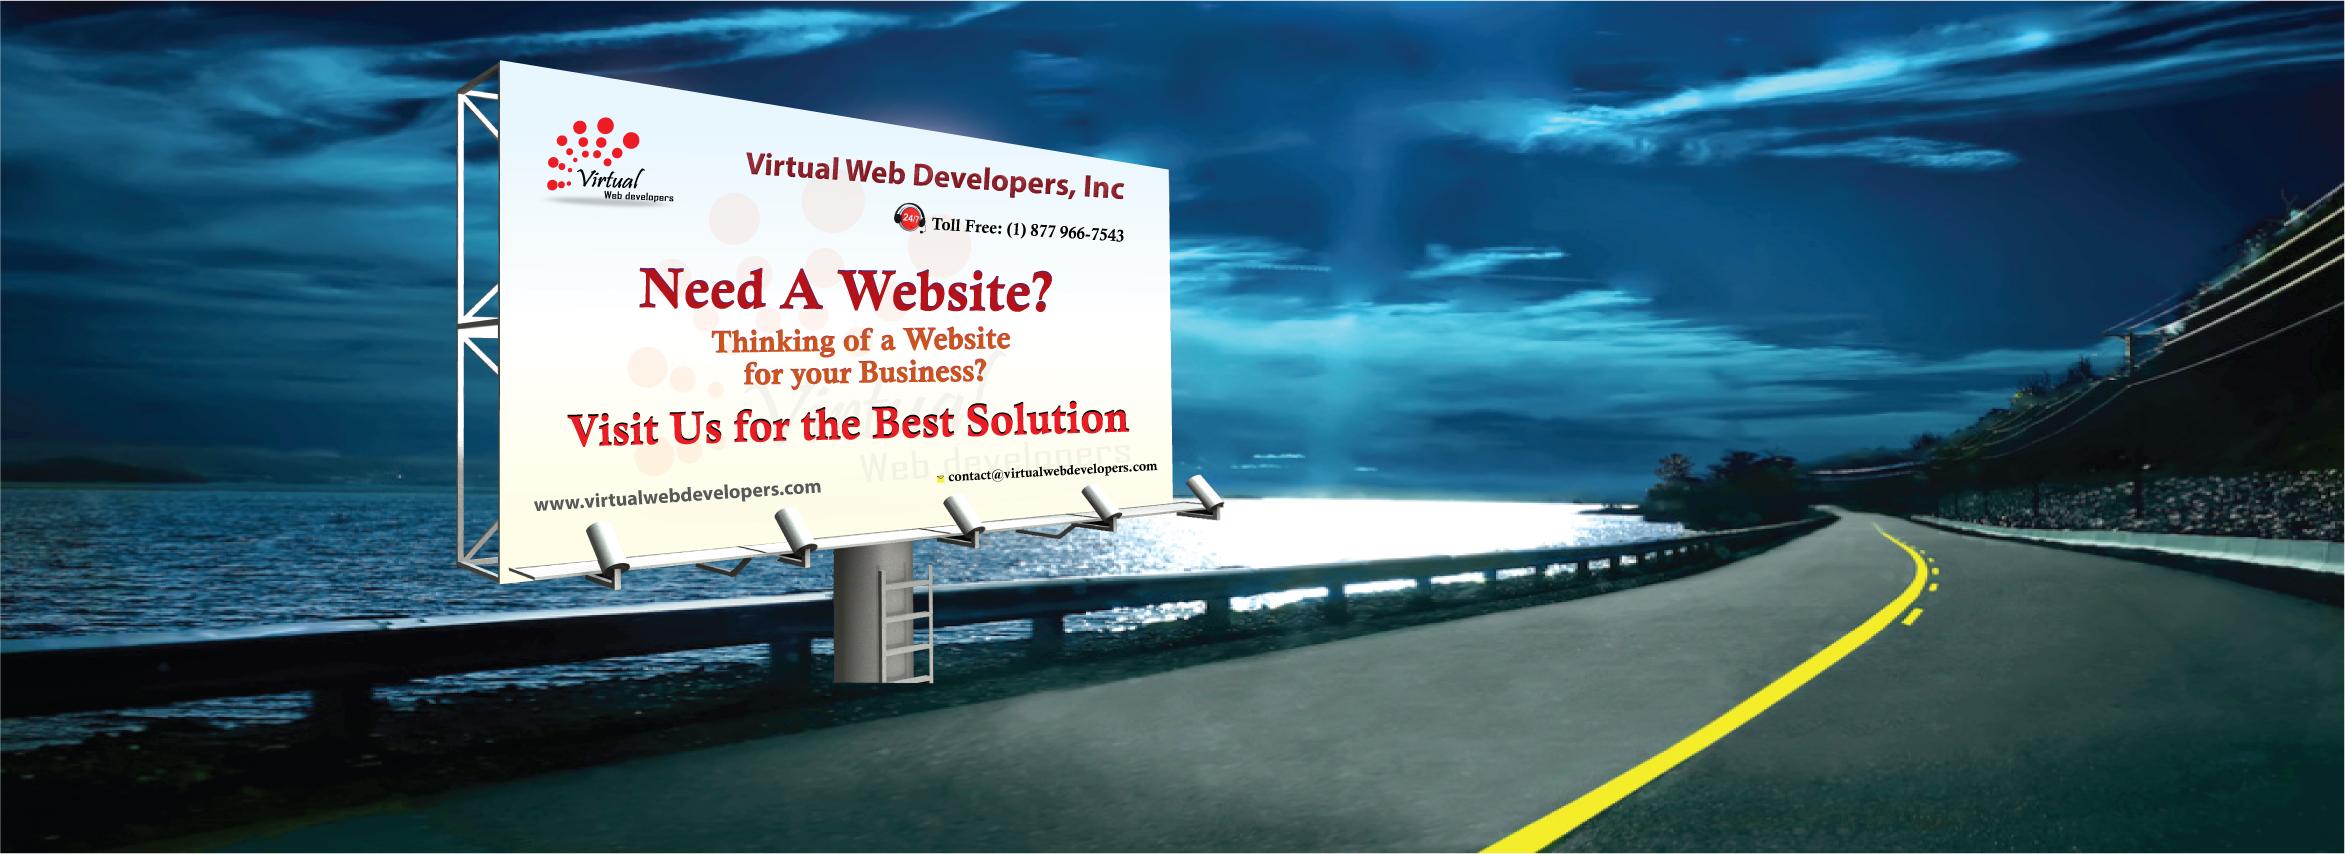 work sample banner design